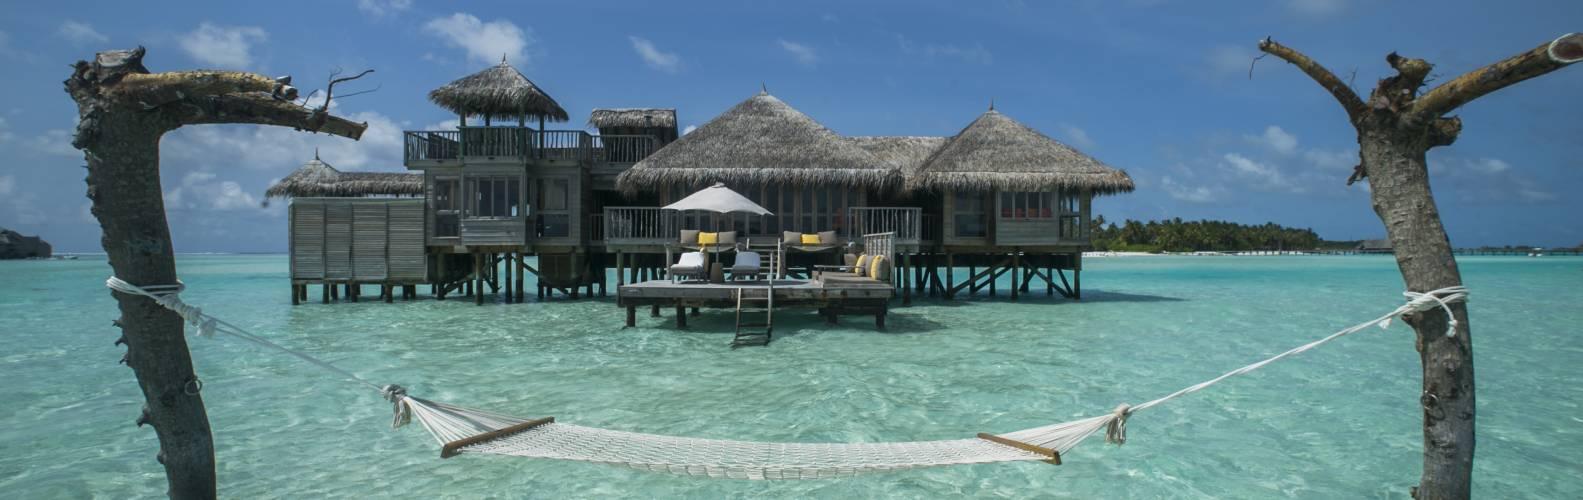 Gili-Lankanfushi-Crusoe-Residence-Exterior-with-Hammock